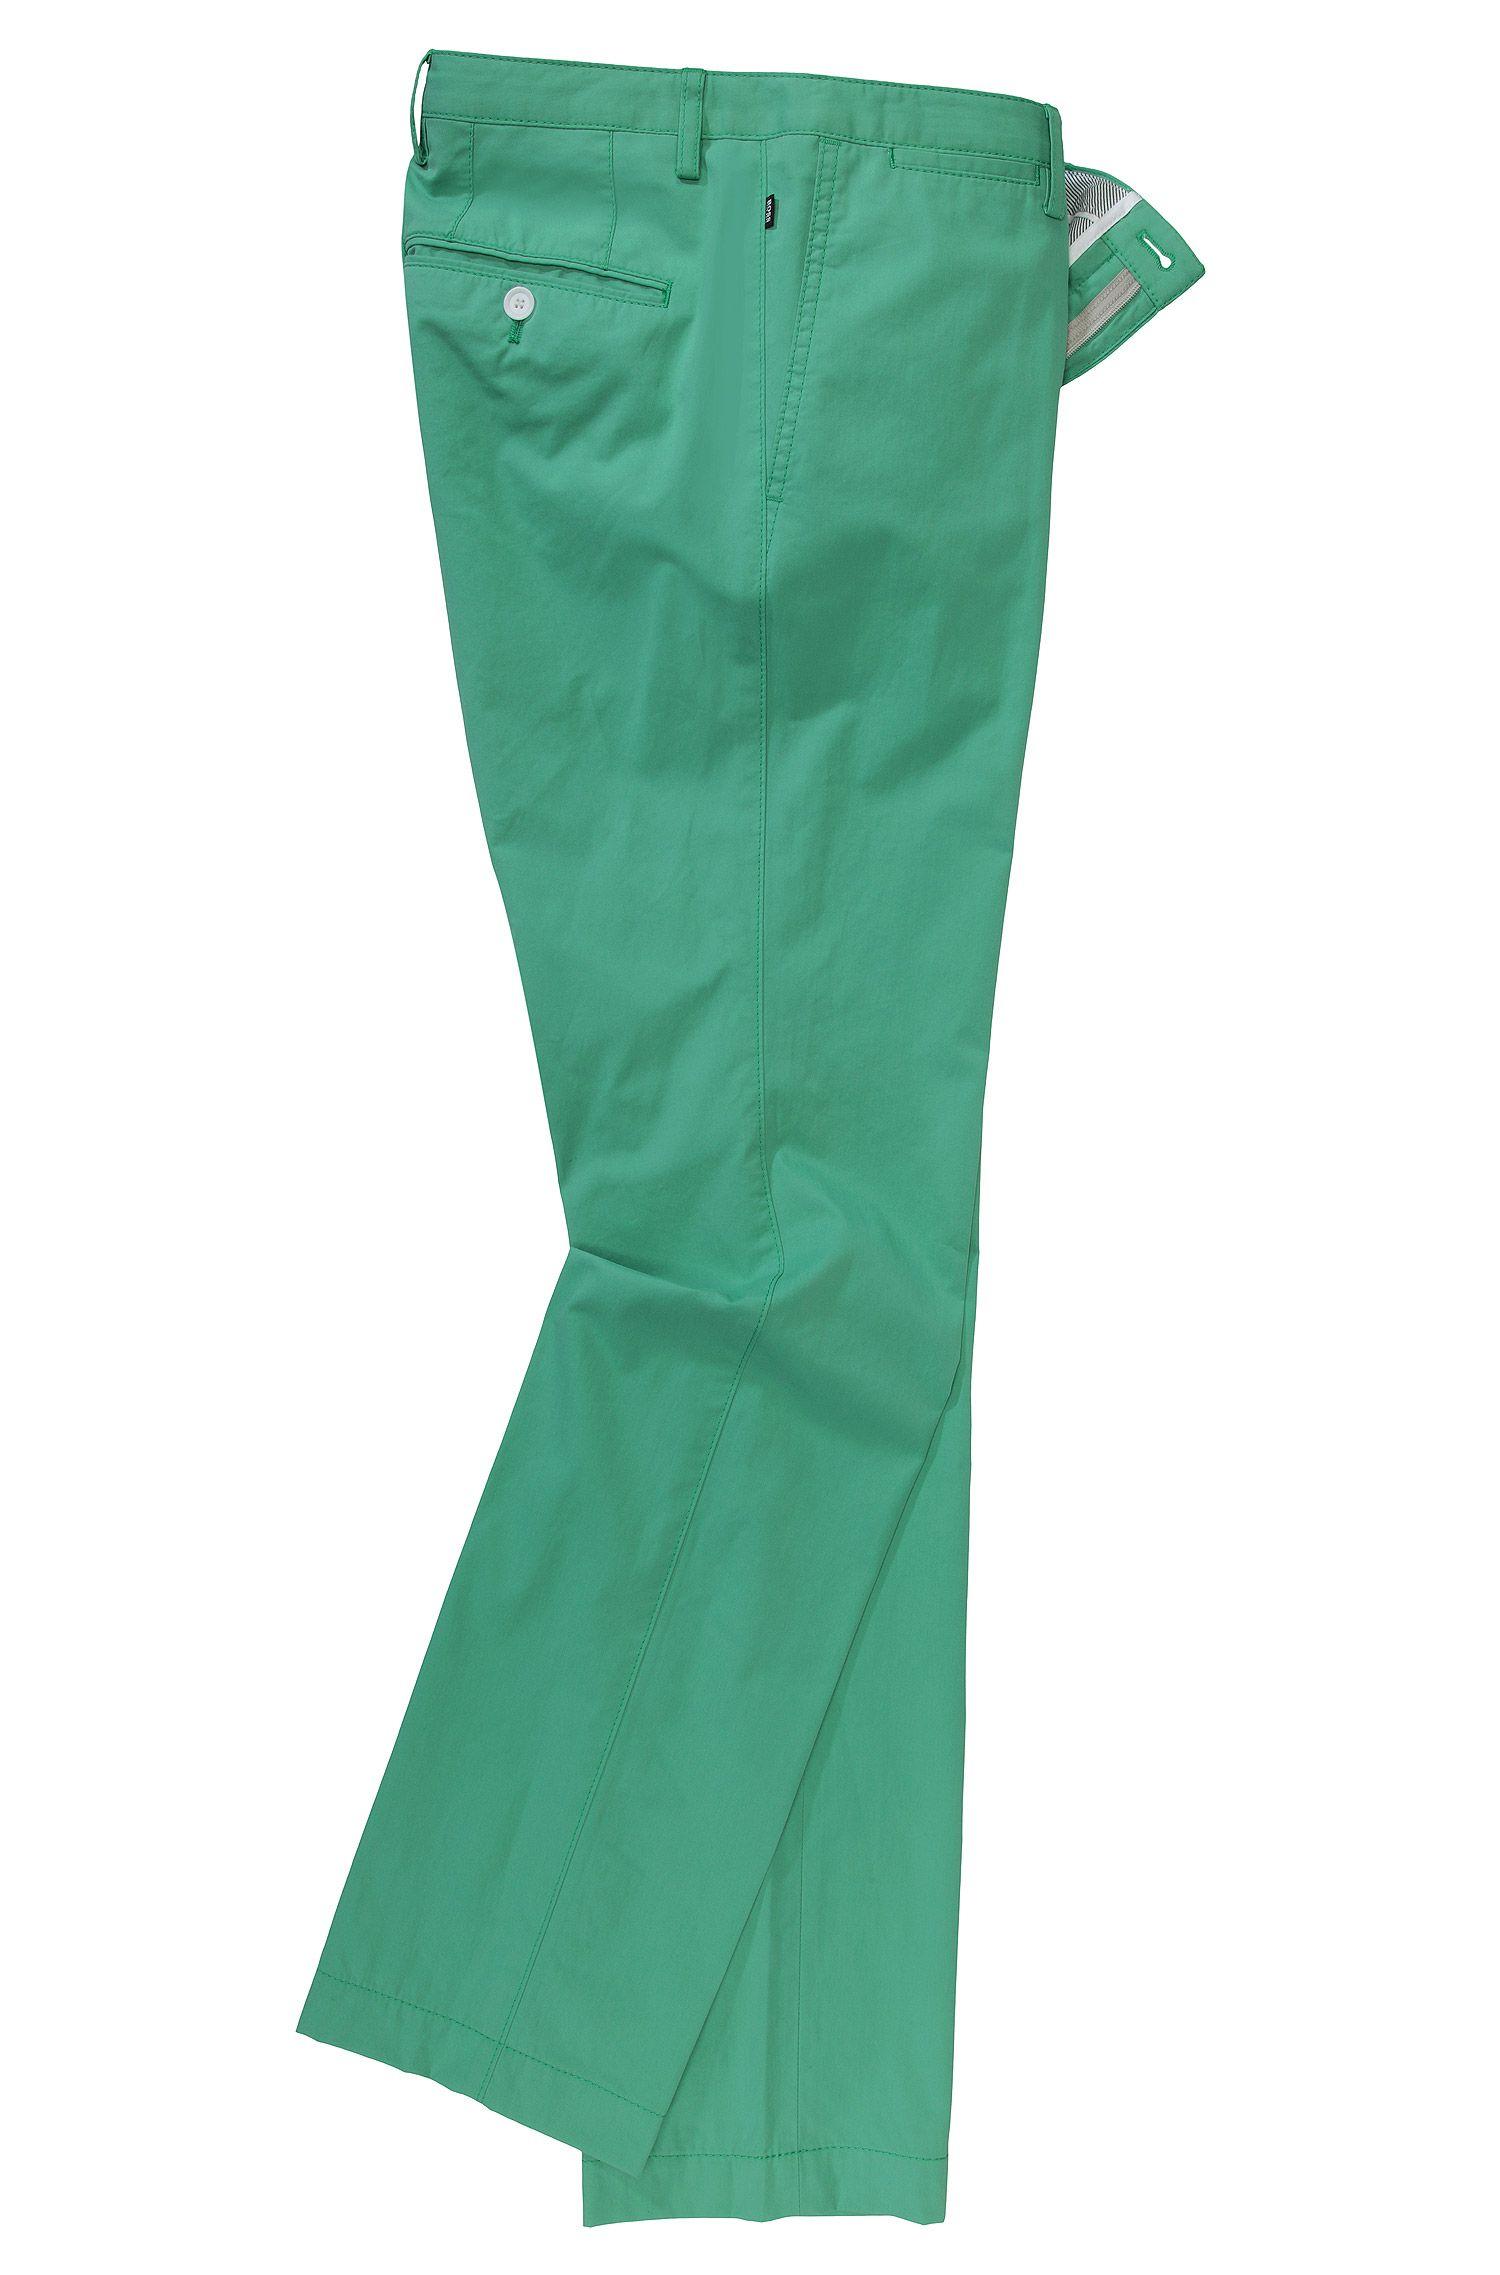 Pantalon chino en pur coton, Stanino3-W